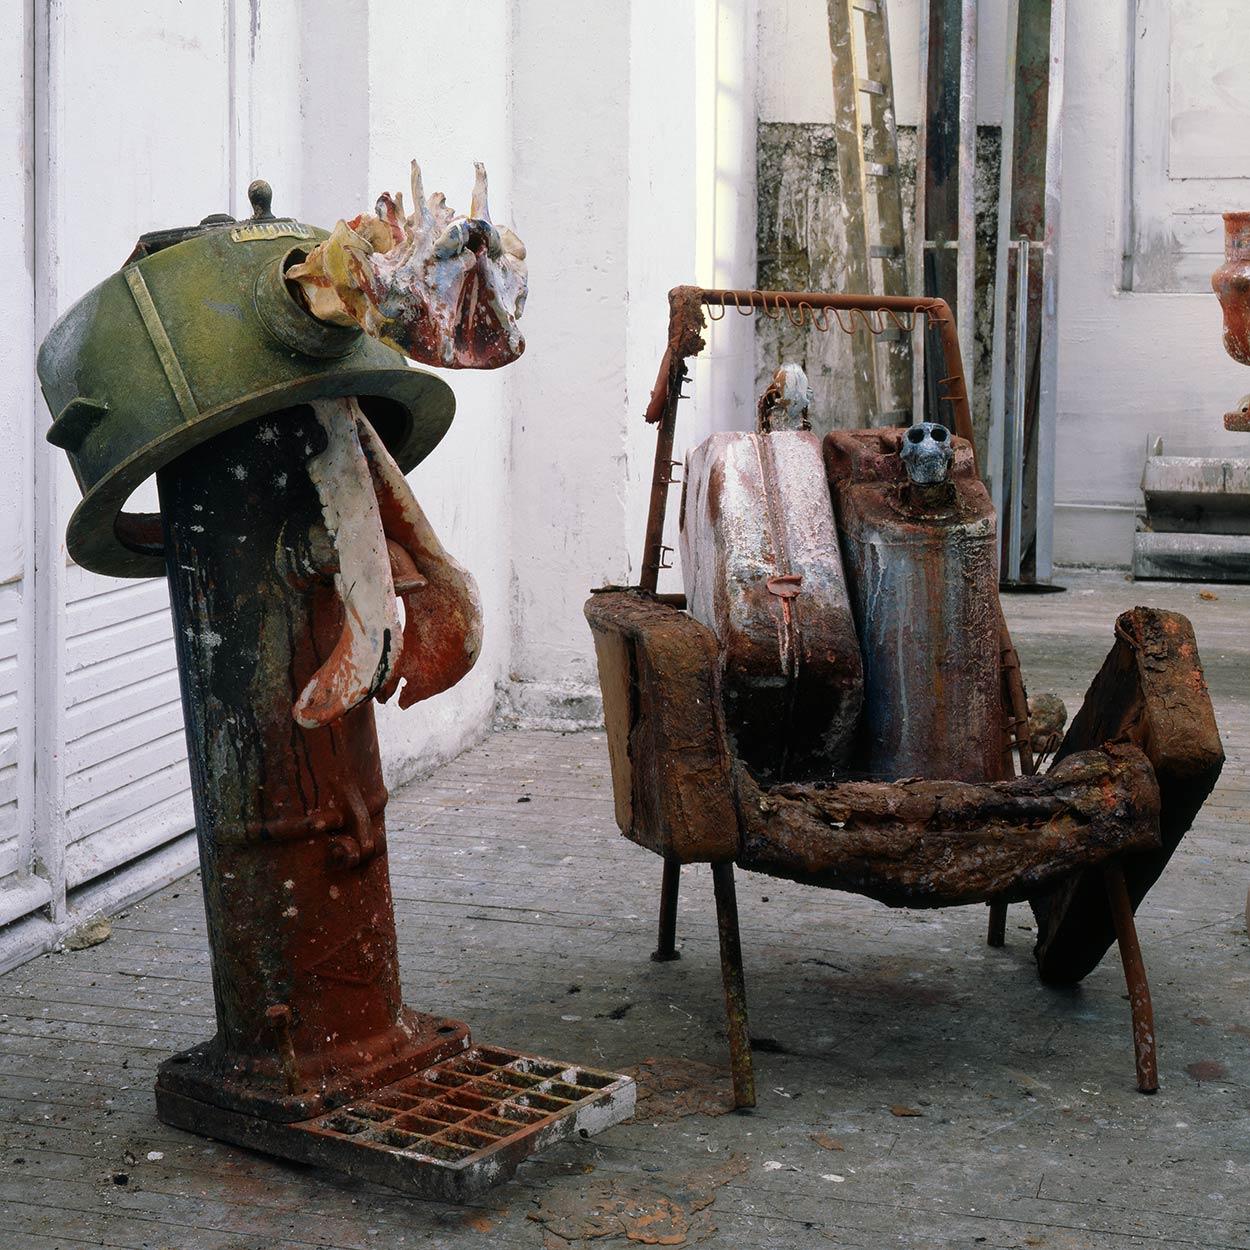 Sculptures at Dado's studio in 1990